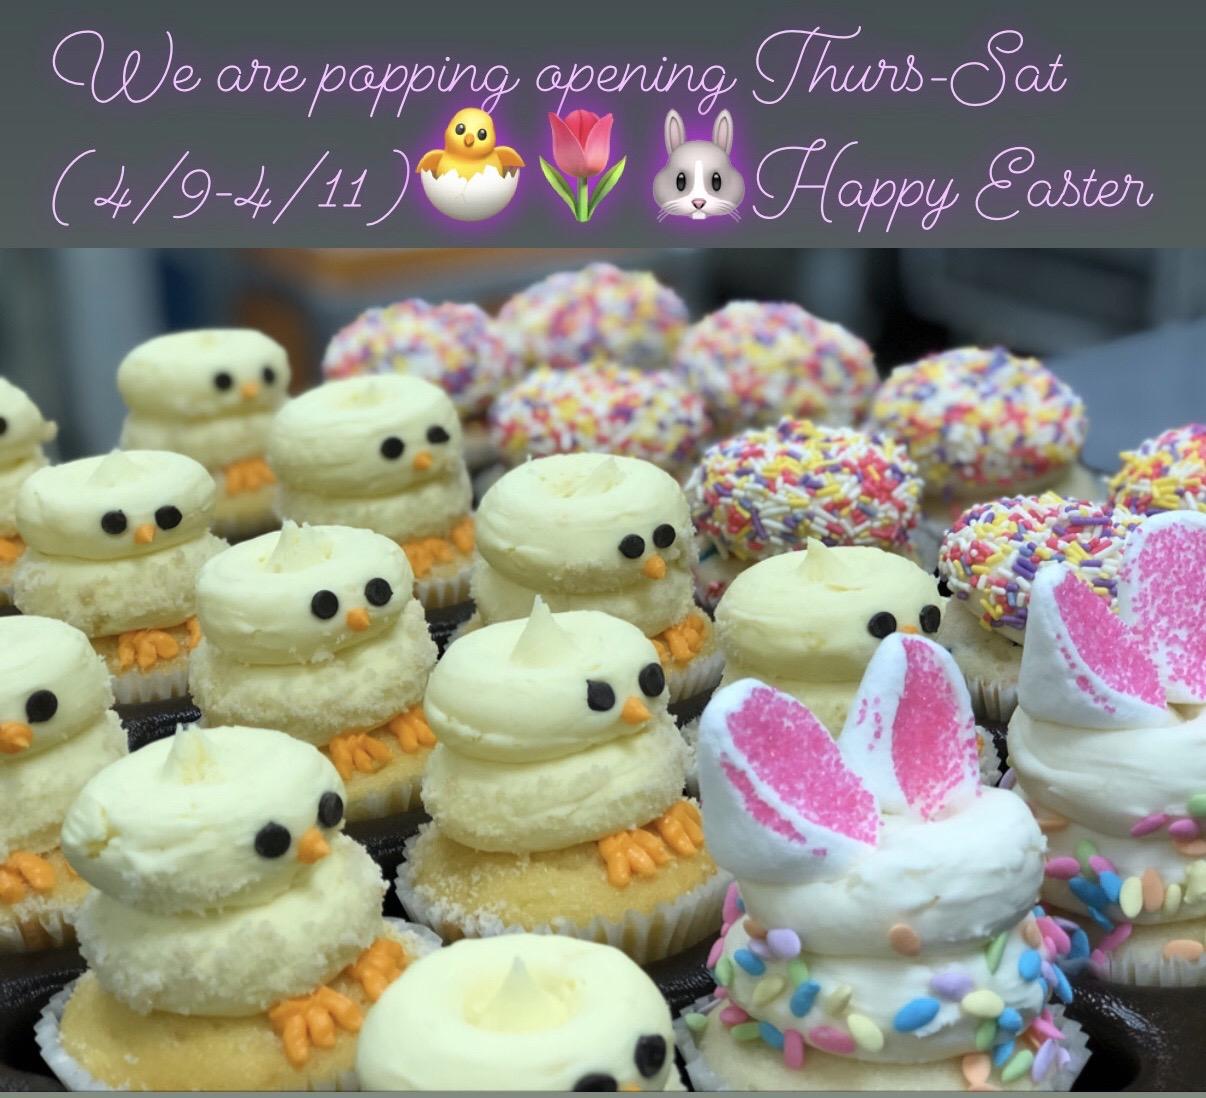 Gigi's cupcakes for Easter